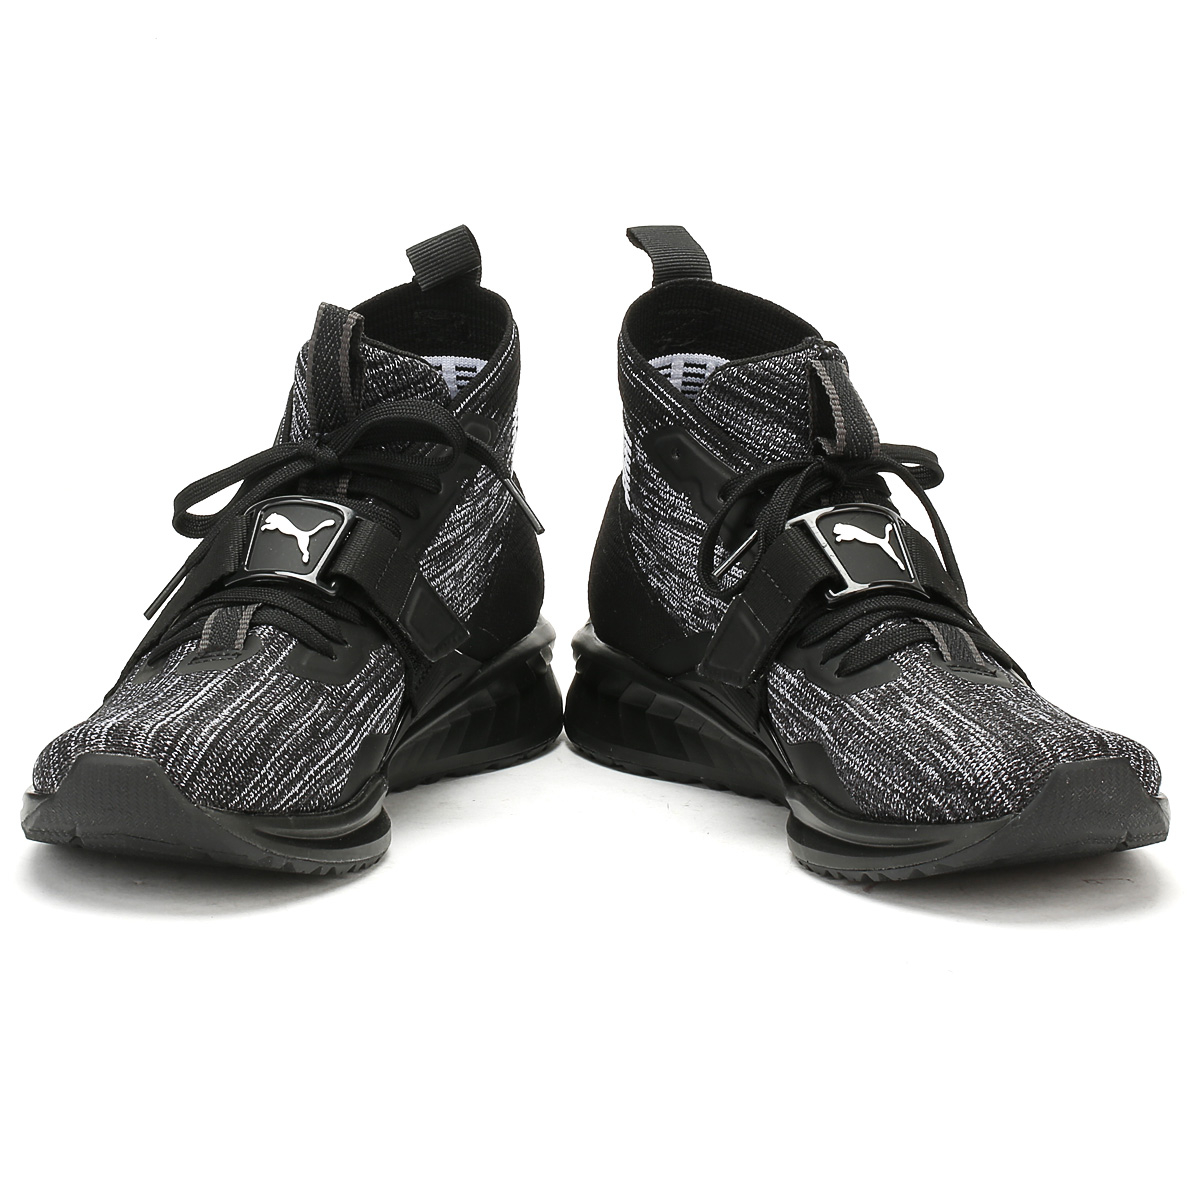 PUMA Mens Black Ignite EvoKnit 2 Trainers Casual Shoes Hi High Tops